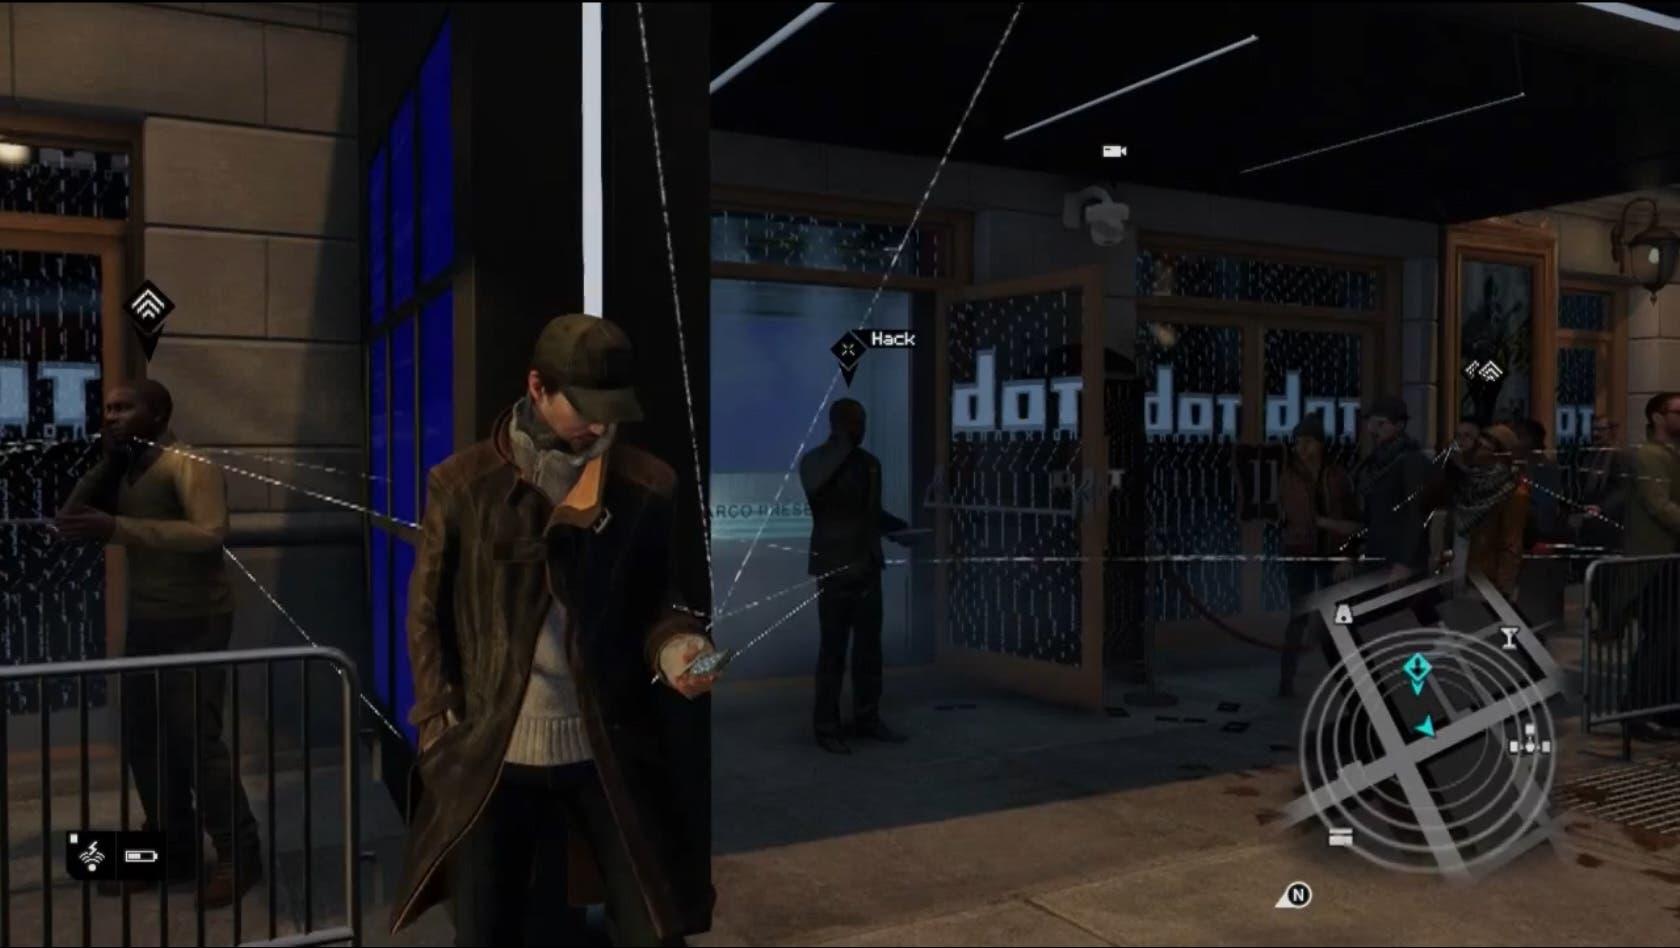 La gran sorpresa de Ubisoft en este E3